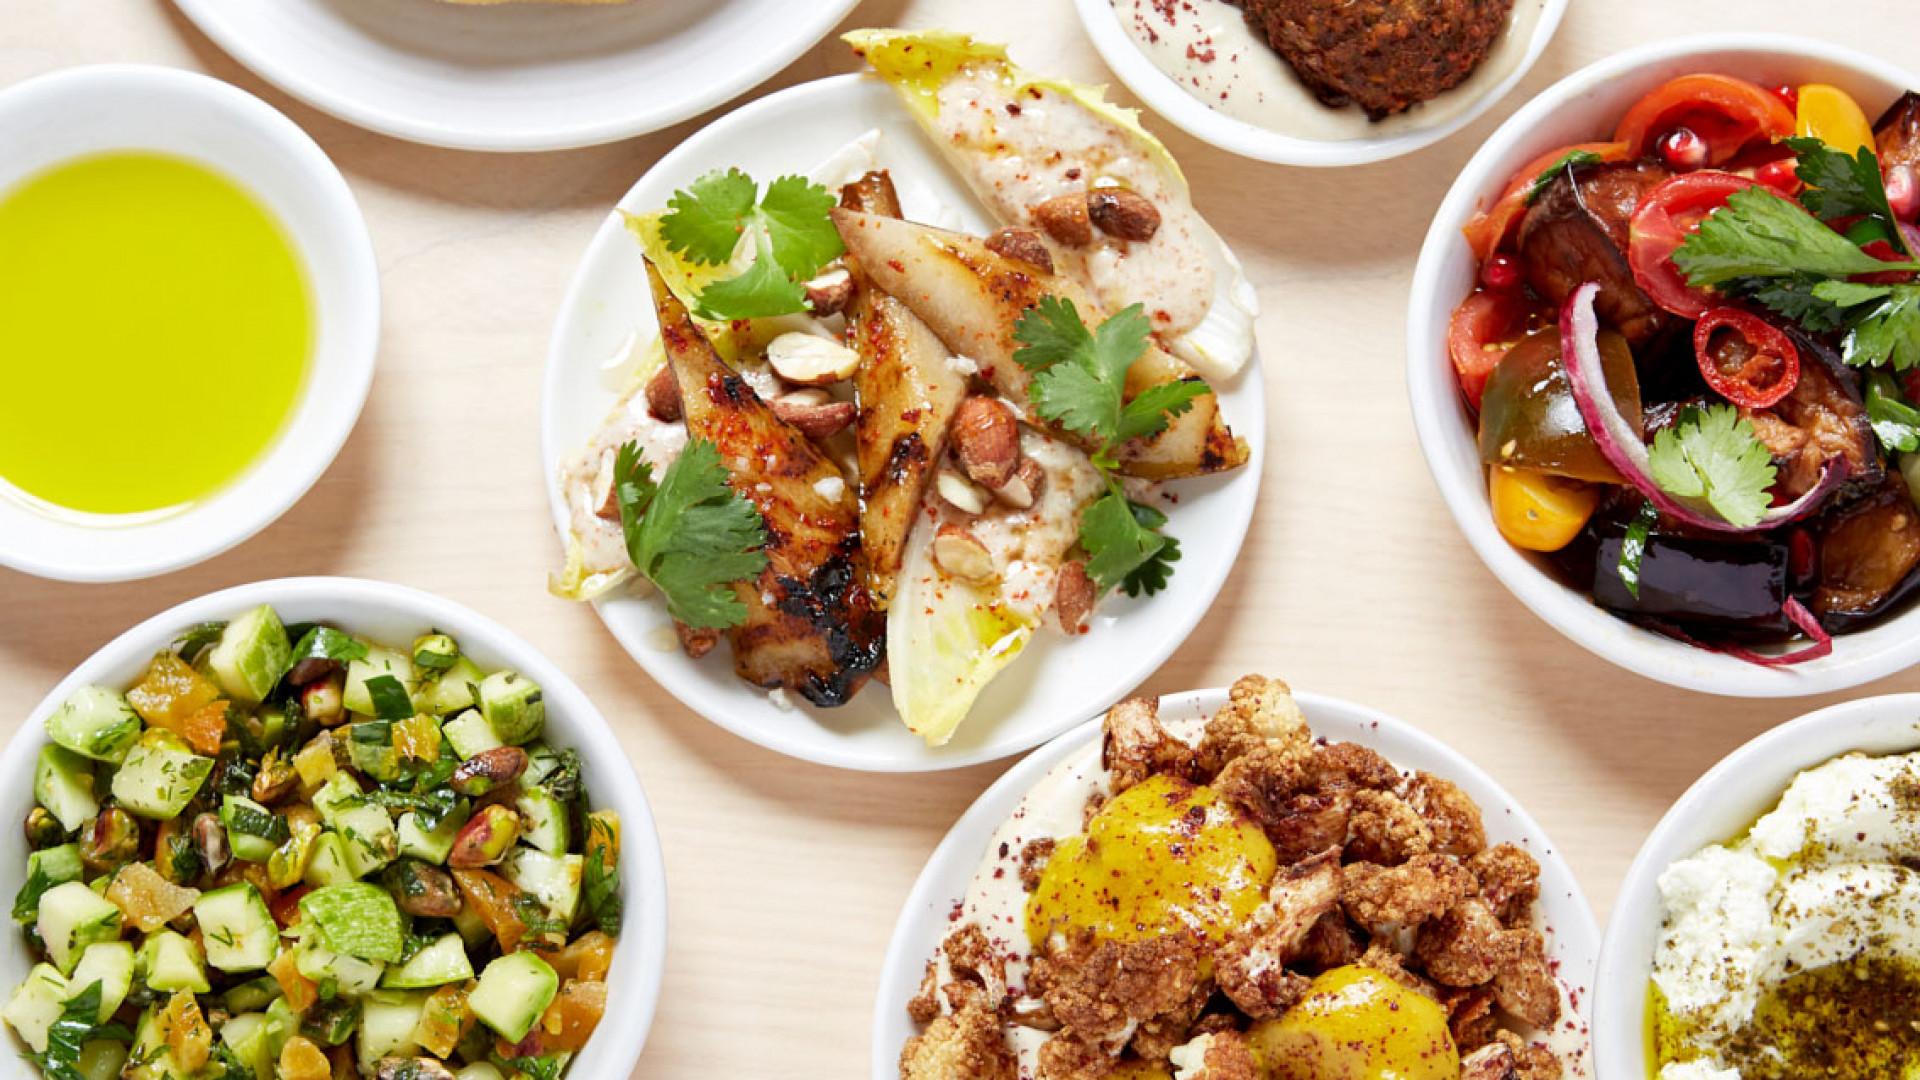 Honey & Smoke: the sharing menu